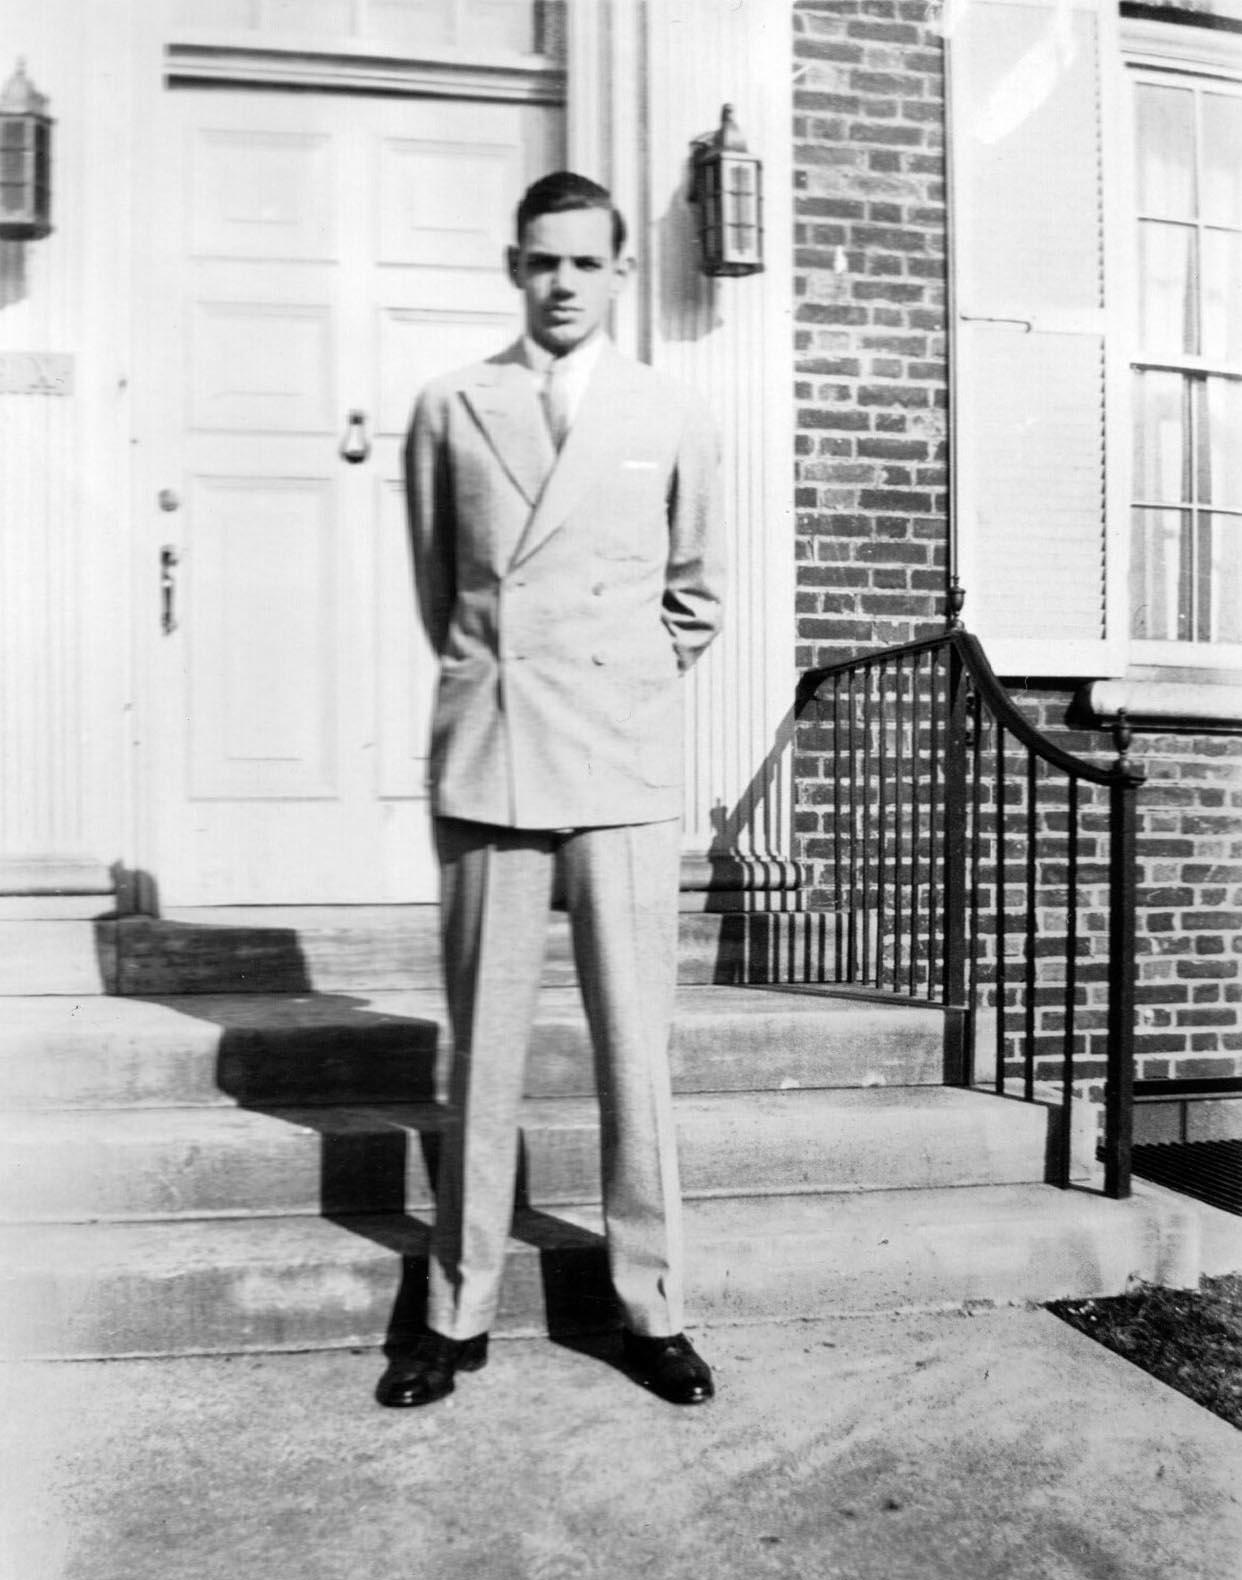 Leonard P. Deubler 1935